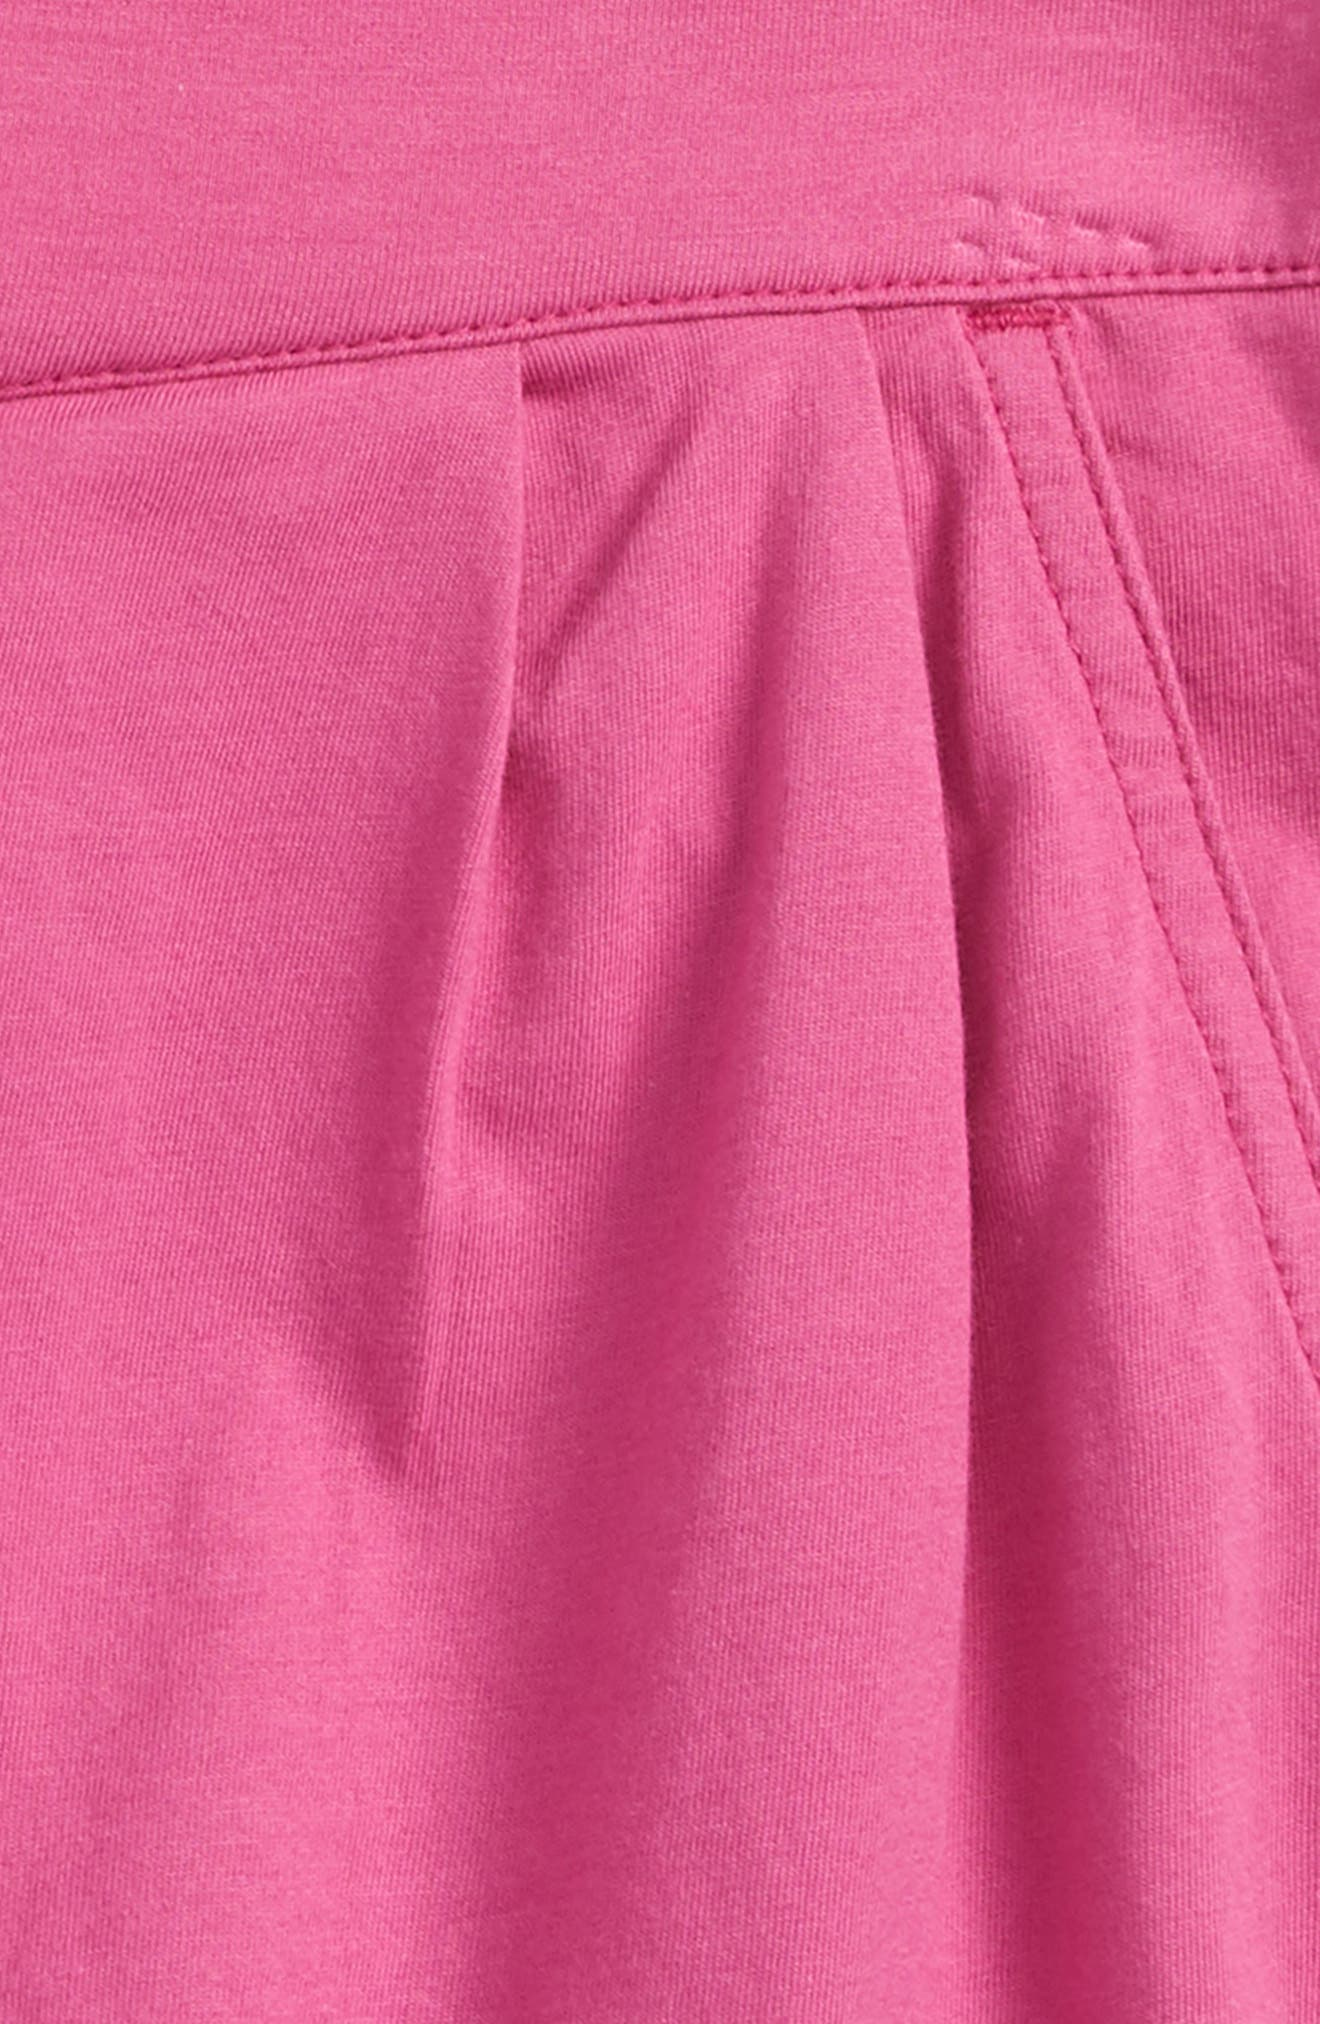 Boat Dock Shorts,                             Alternate thumbnail 5, color,